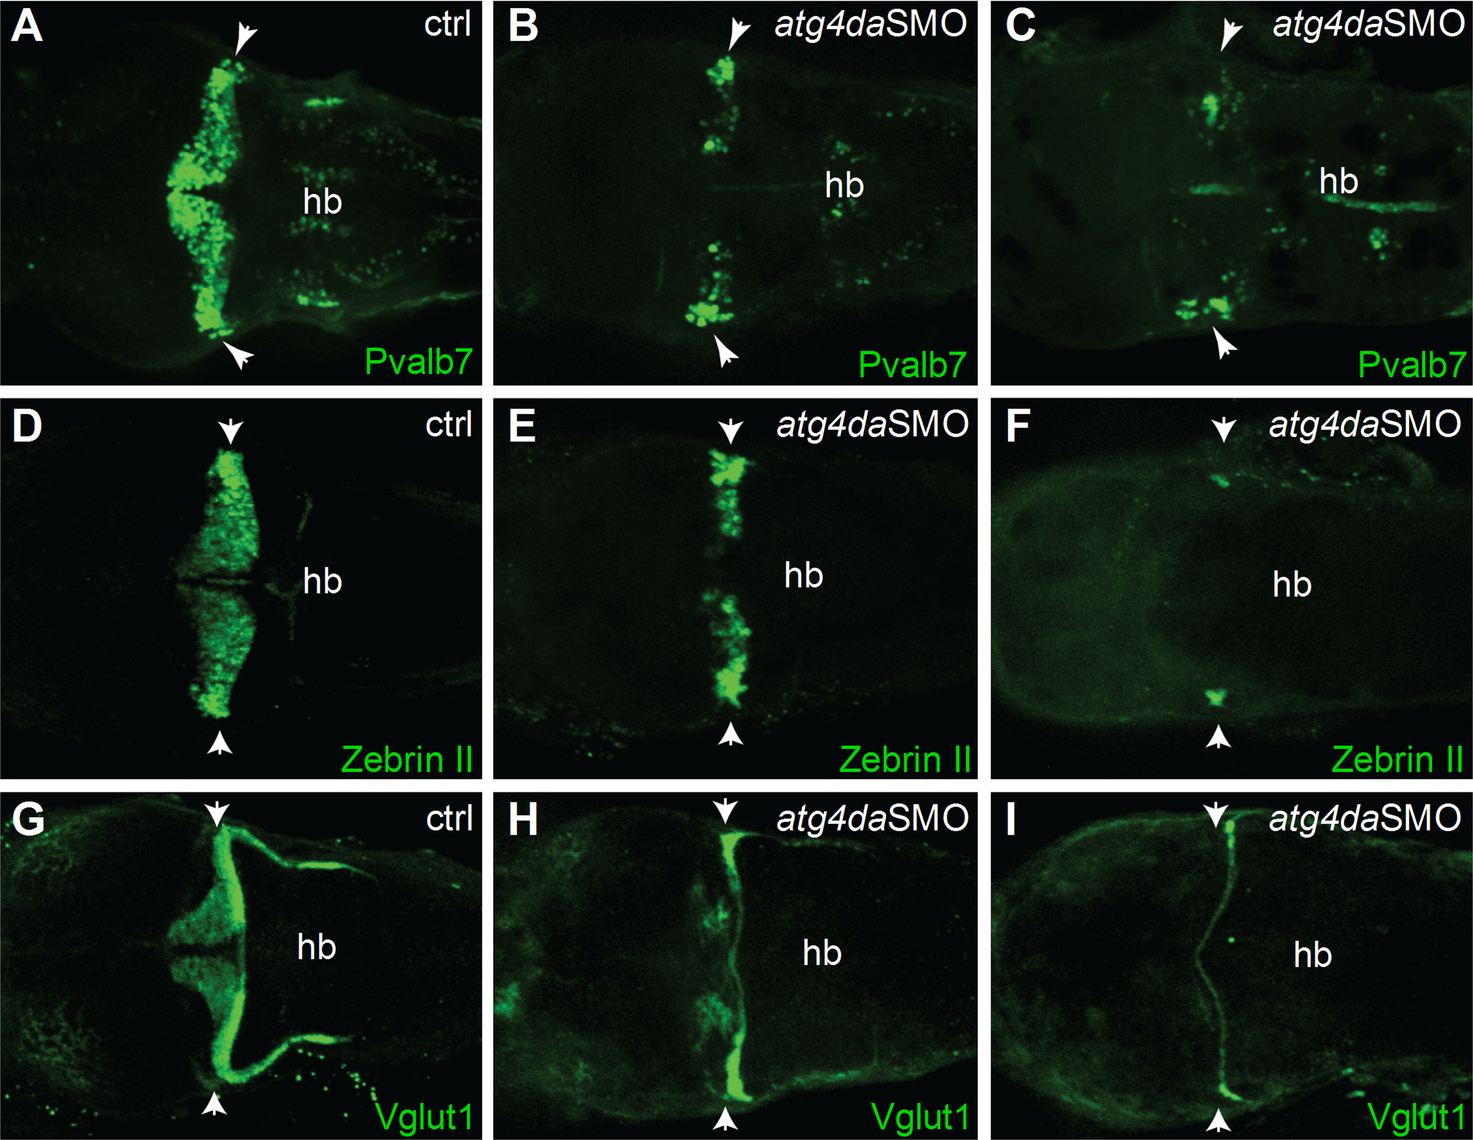 Suppression of <i>atg4da</i> in zebrafish leads to loss of cerebellar neurons.